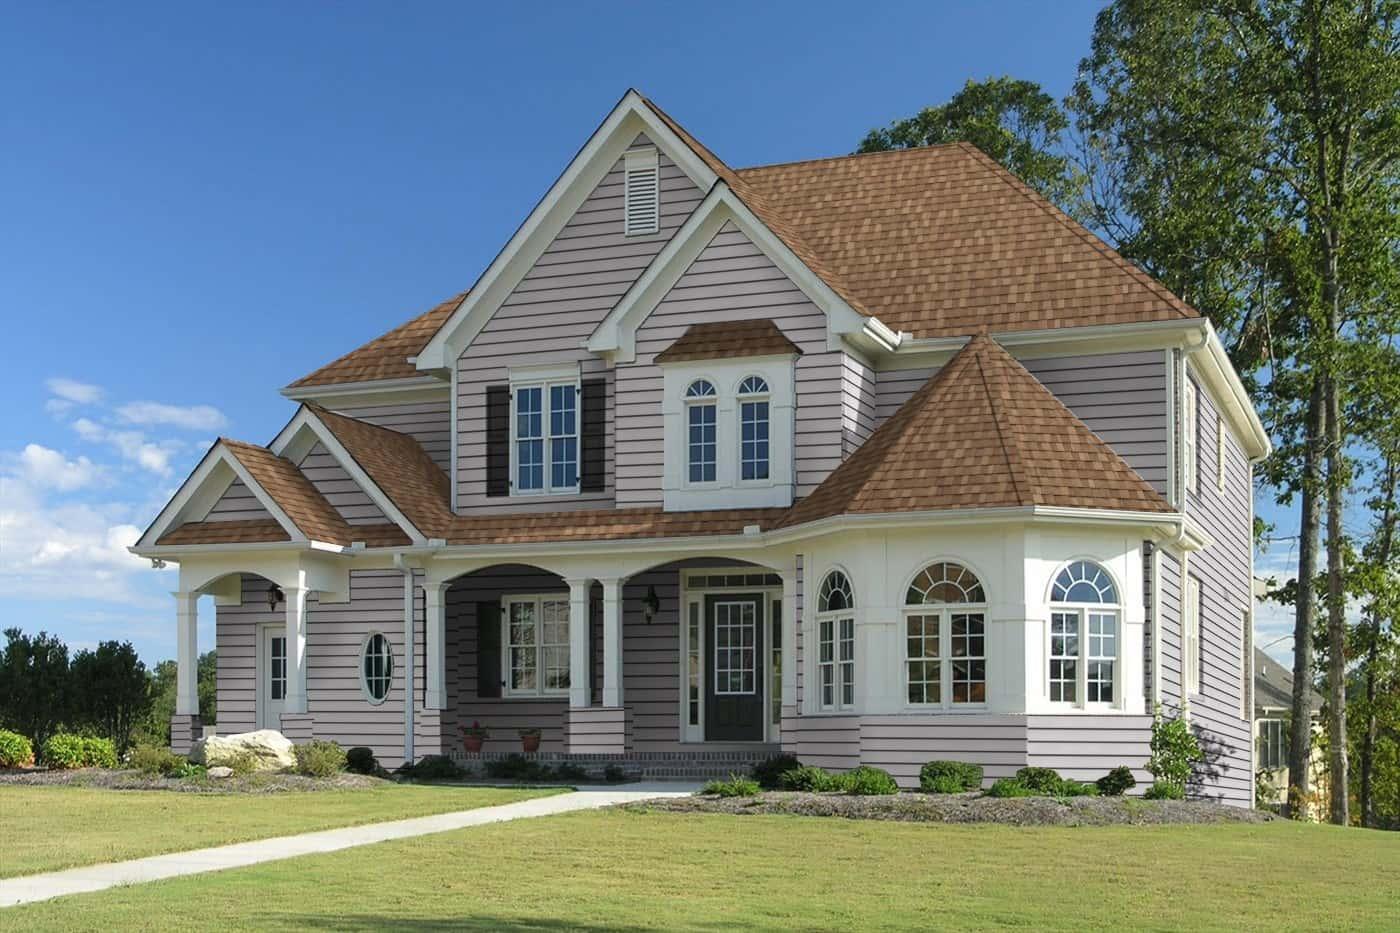 TAMKO Heritage Premium Rustic Cedar House